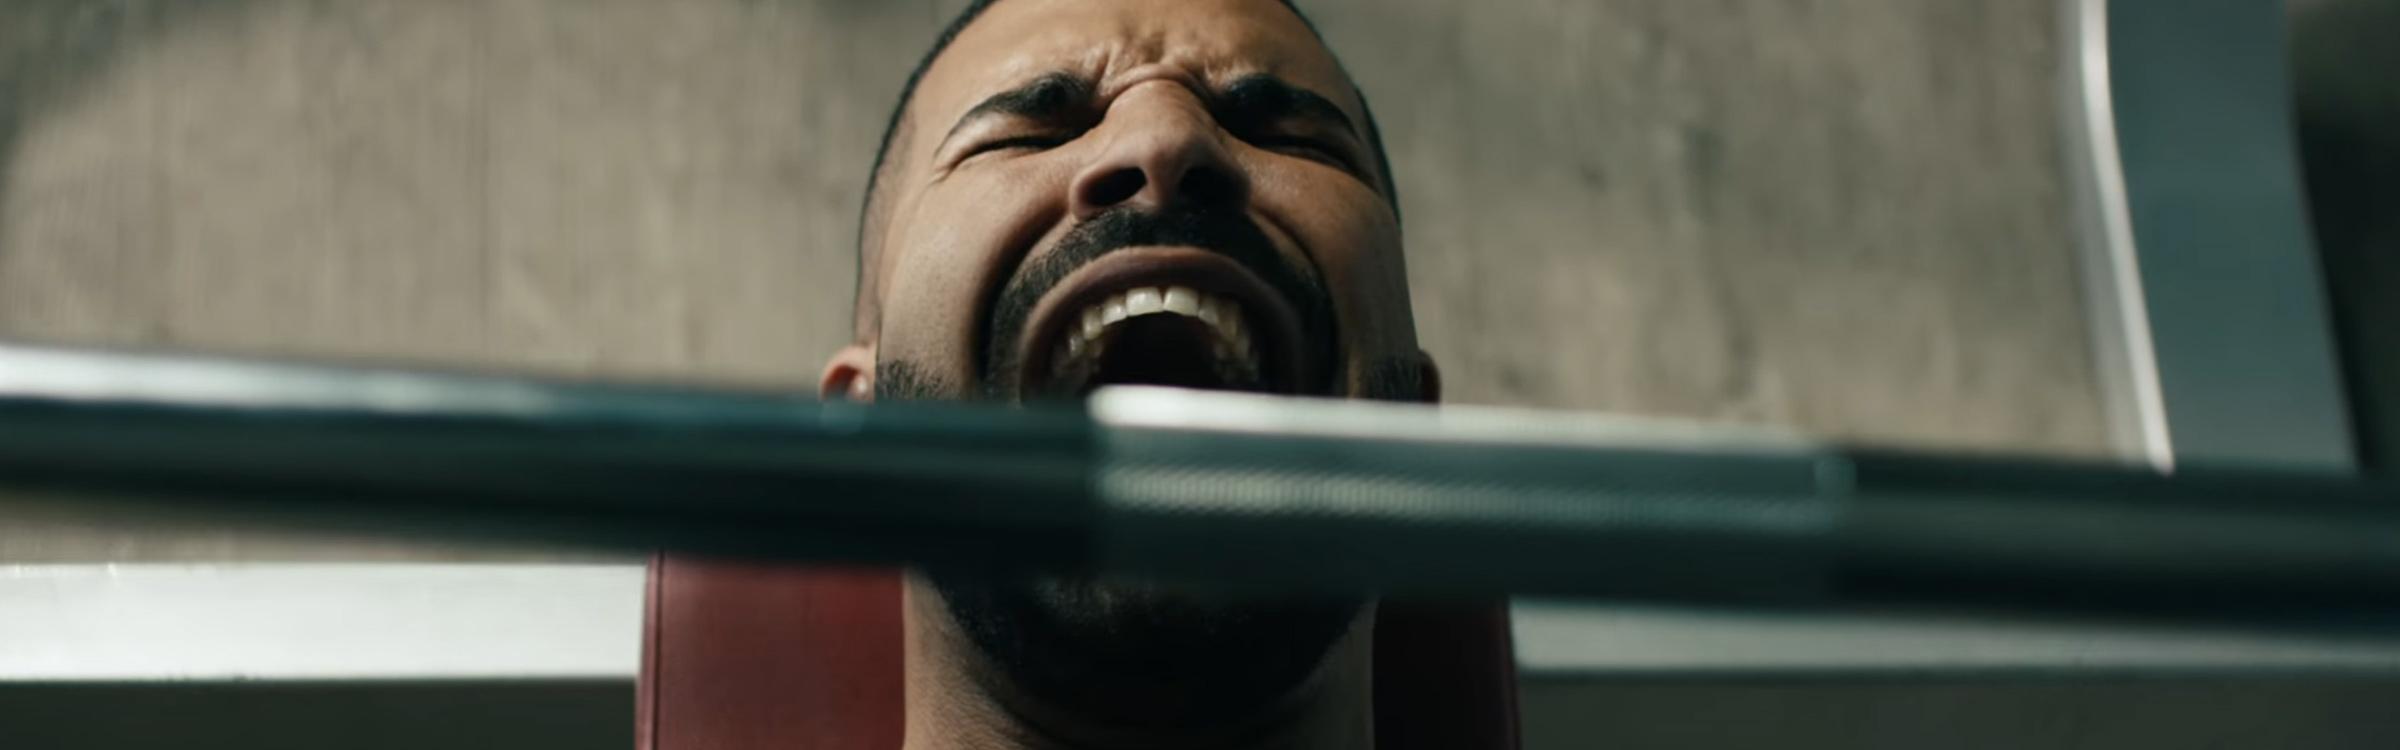 Drake badblood header